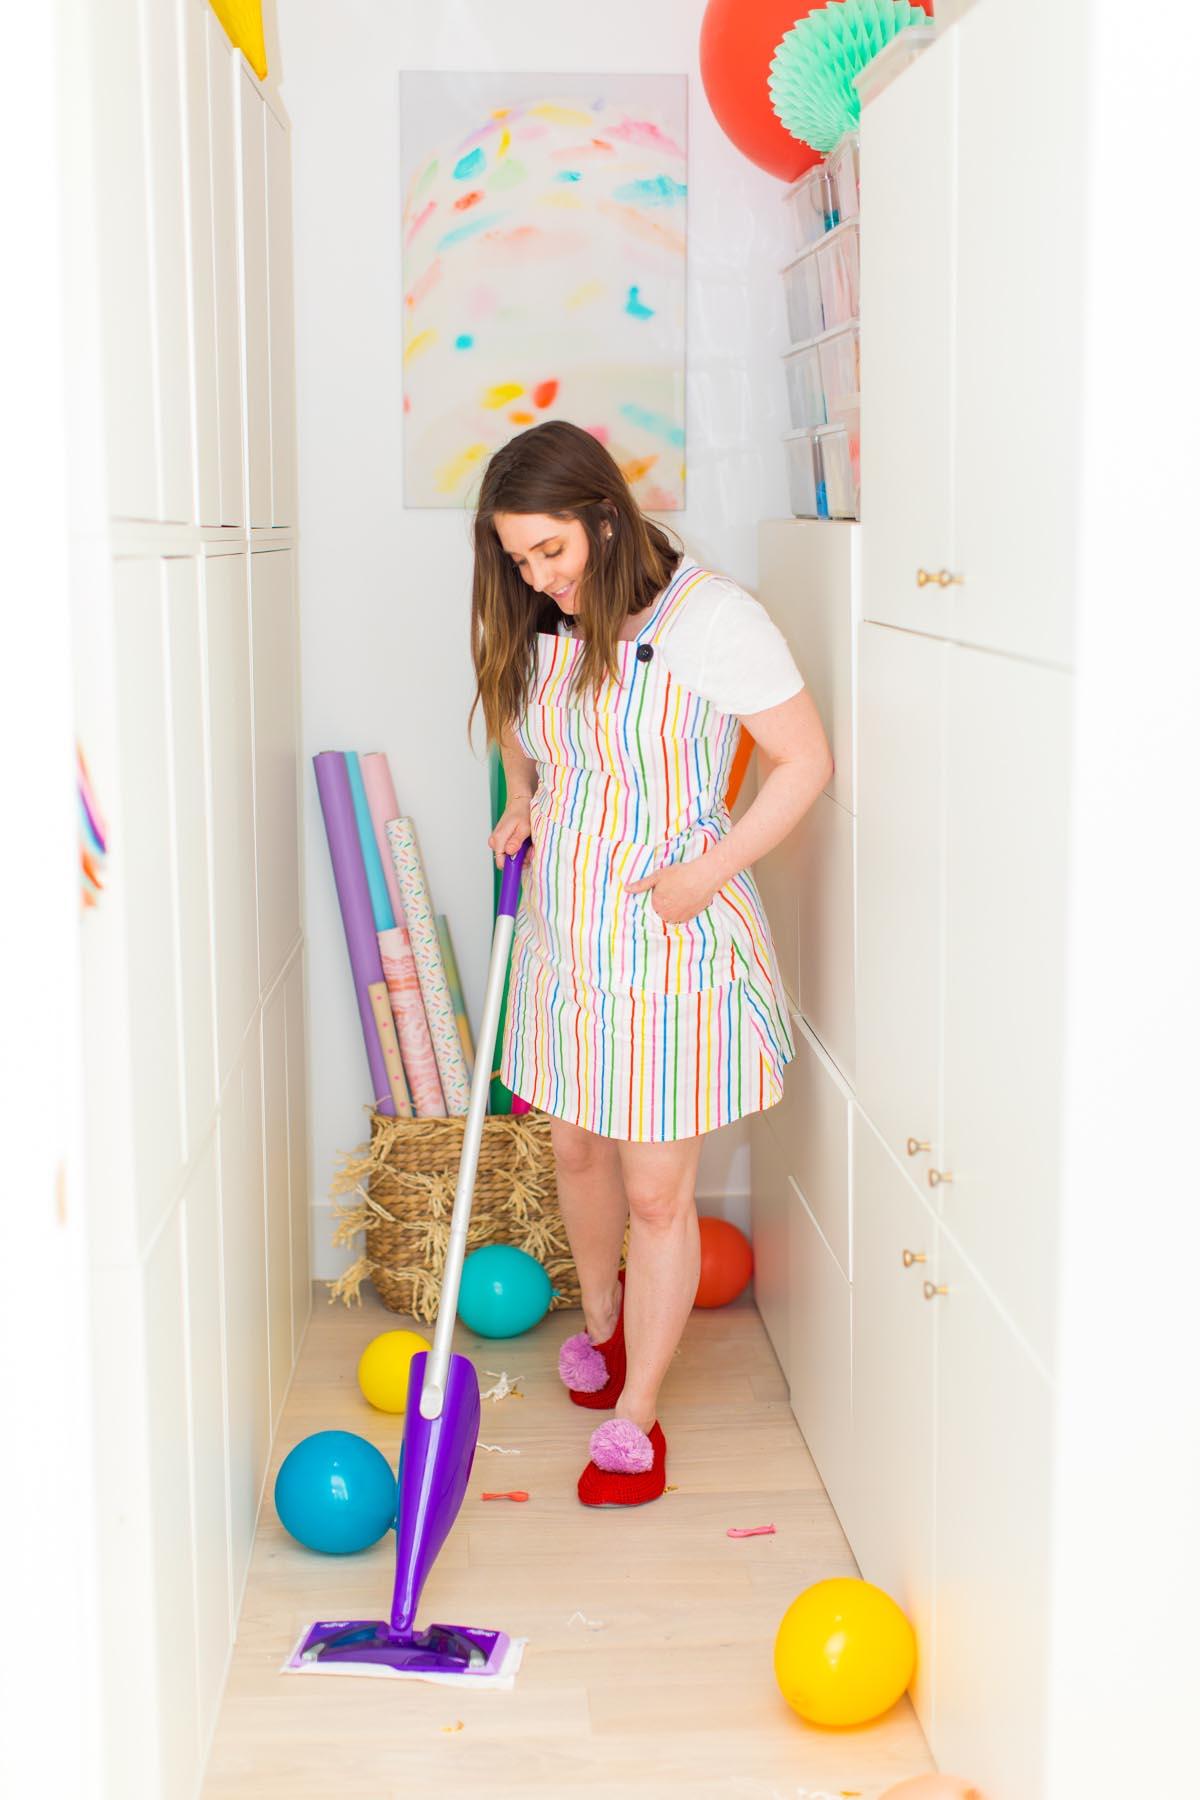 Craft-closet-organization-and-cleanup